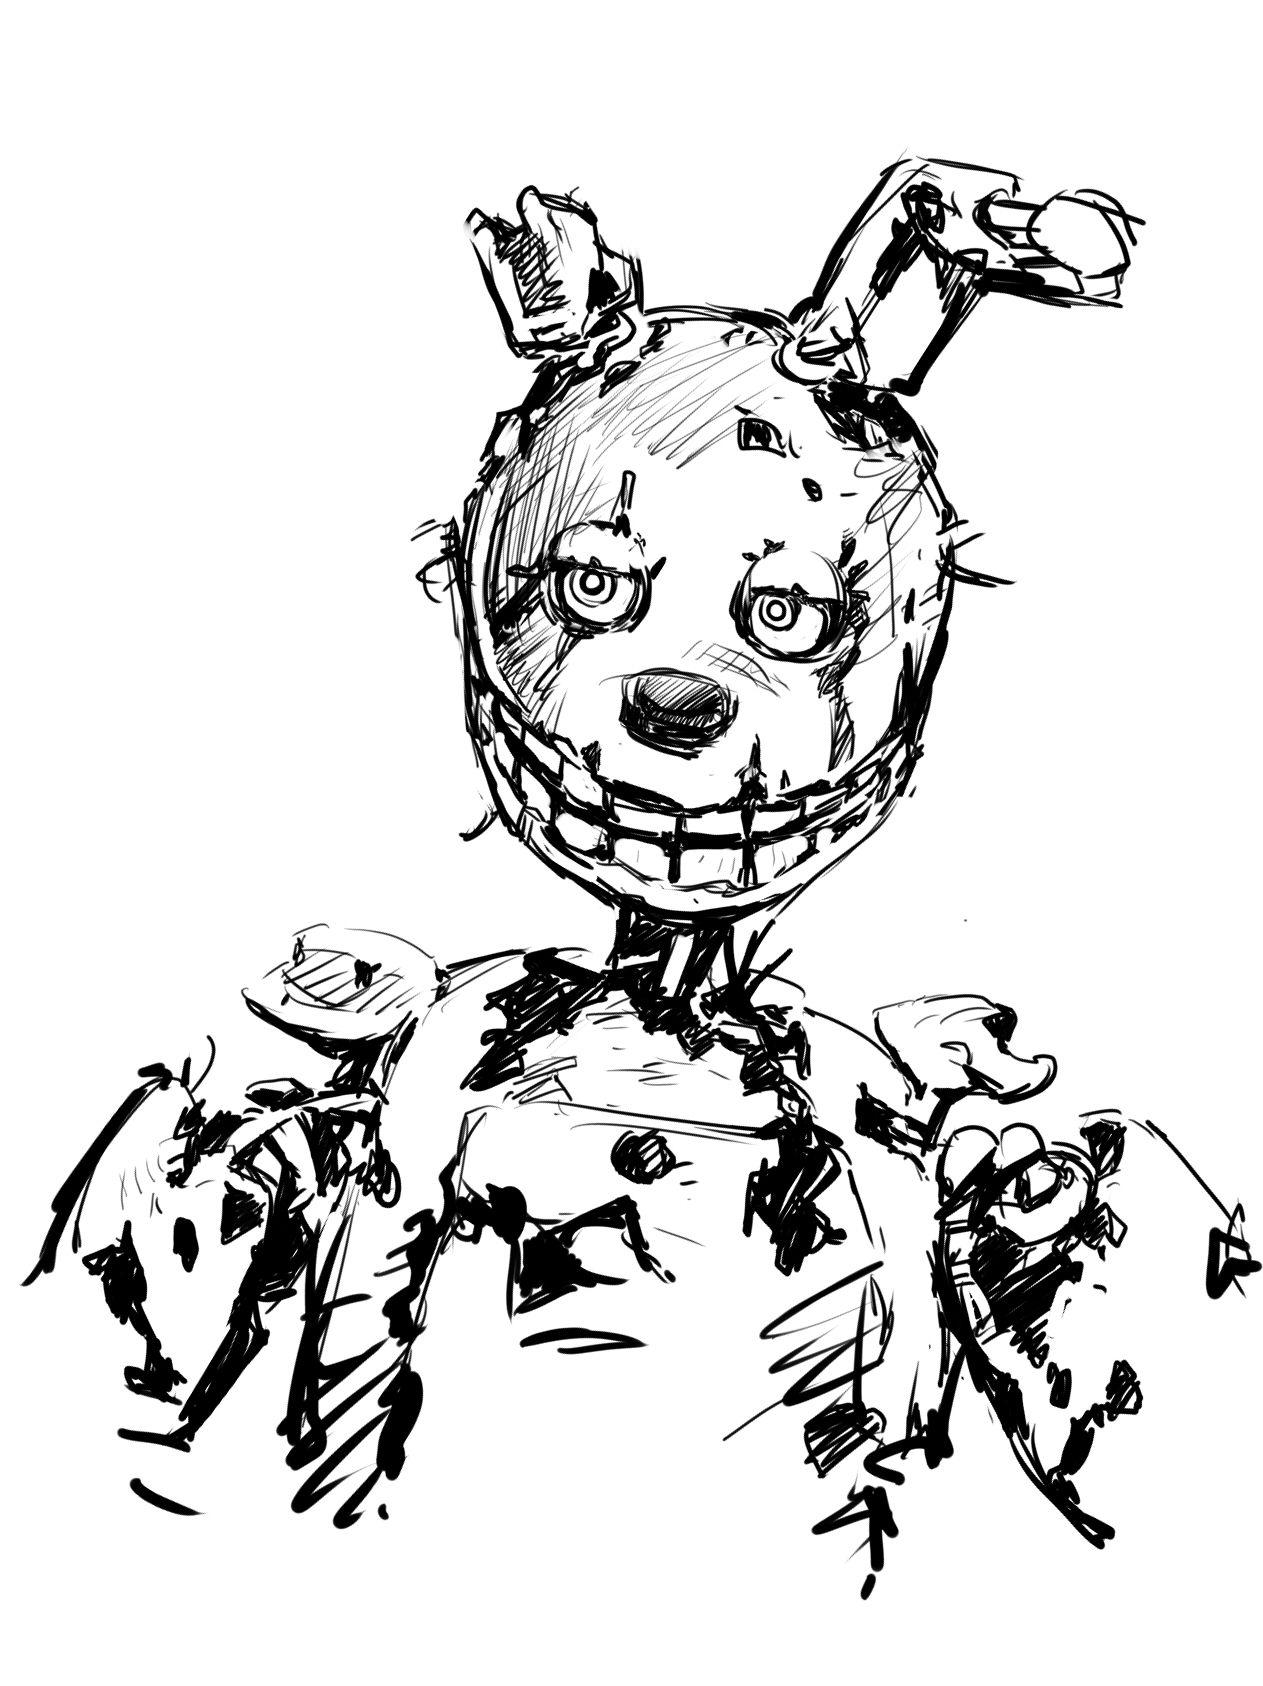 springtrap with images  fnaf coloring pages trap art fnaf